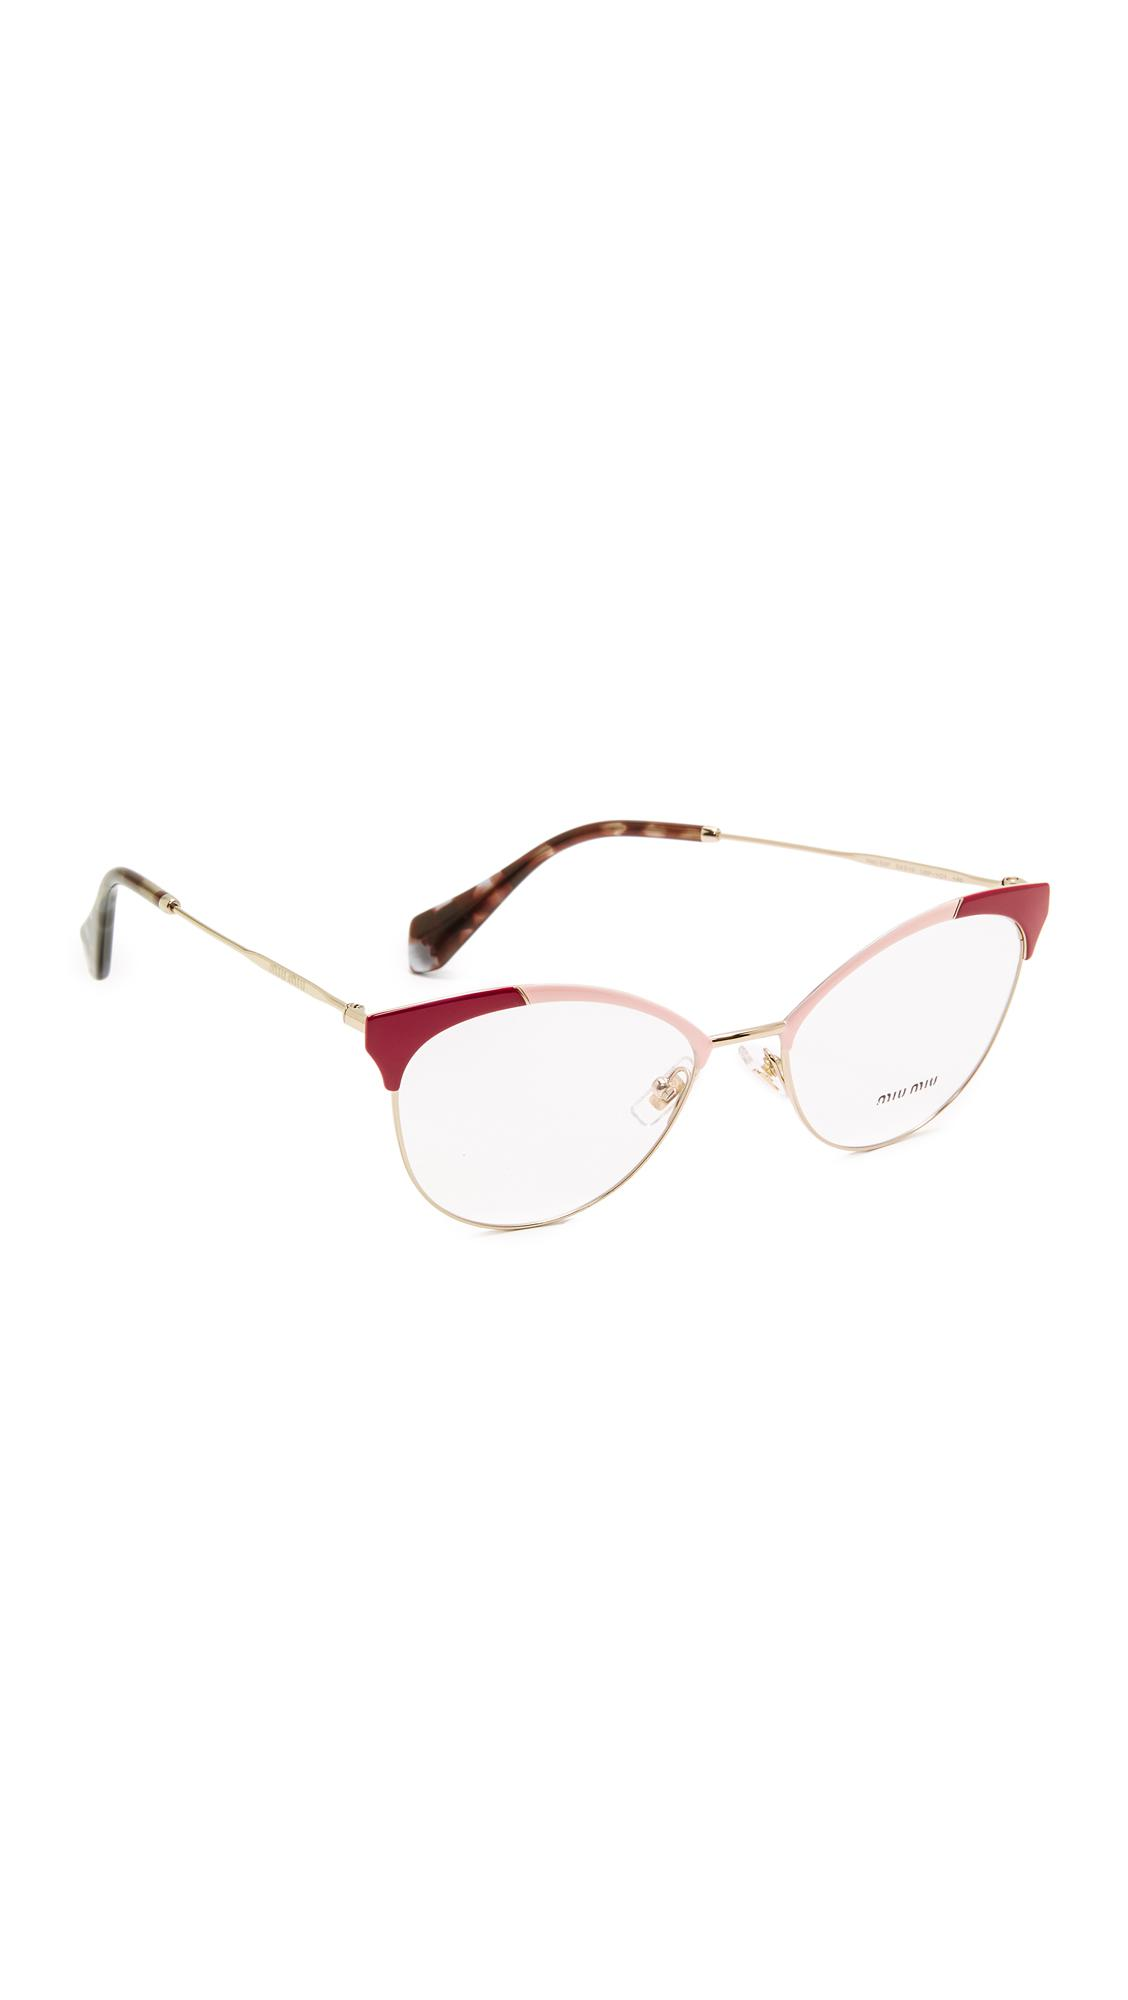 90201652b1fa Lyst - Miu Miu Colorblock Glasses